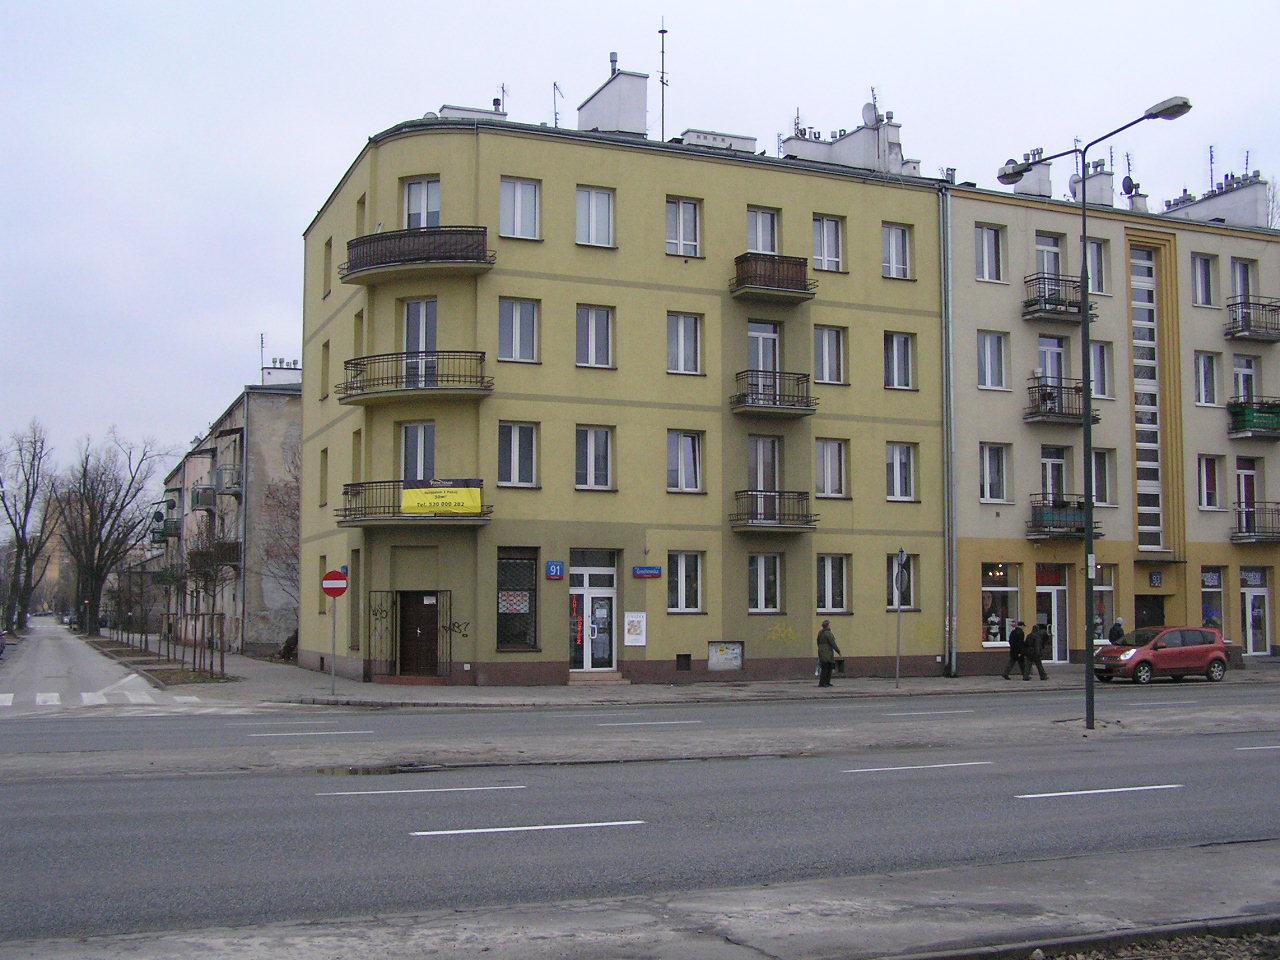 Grochowska 91